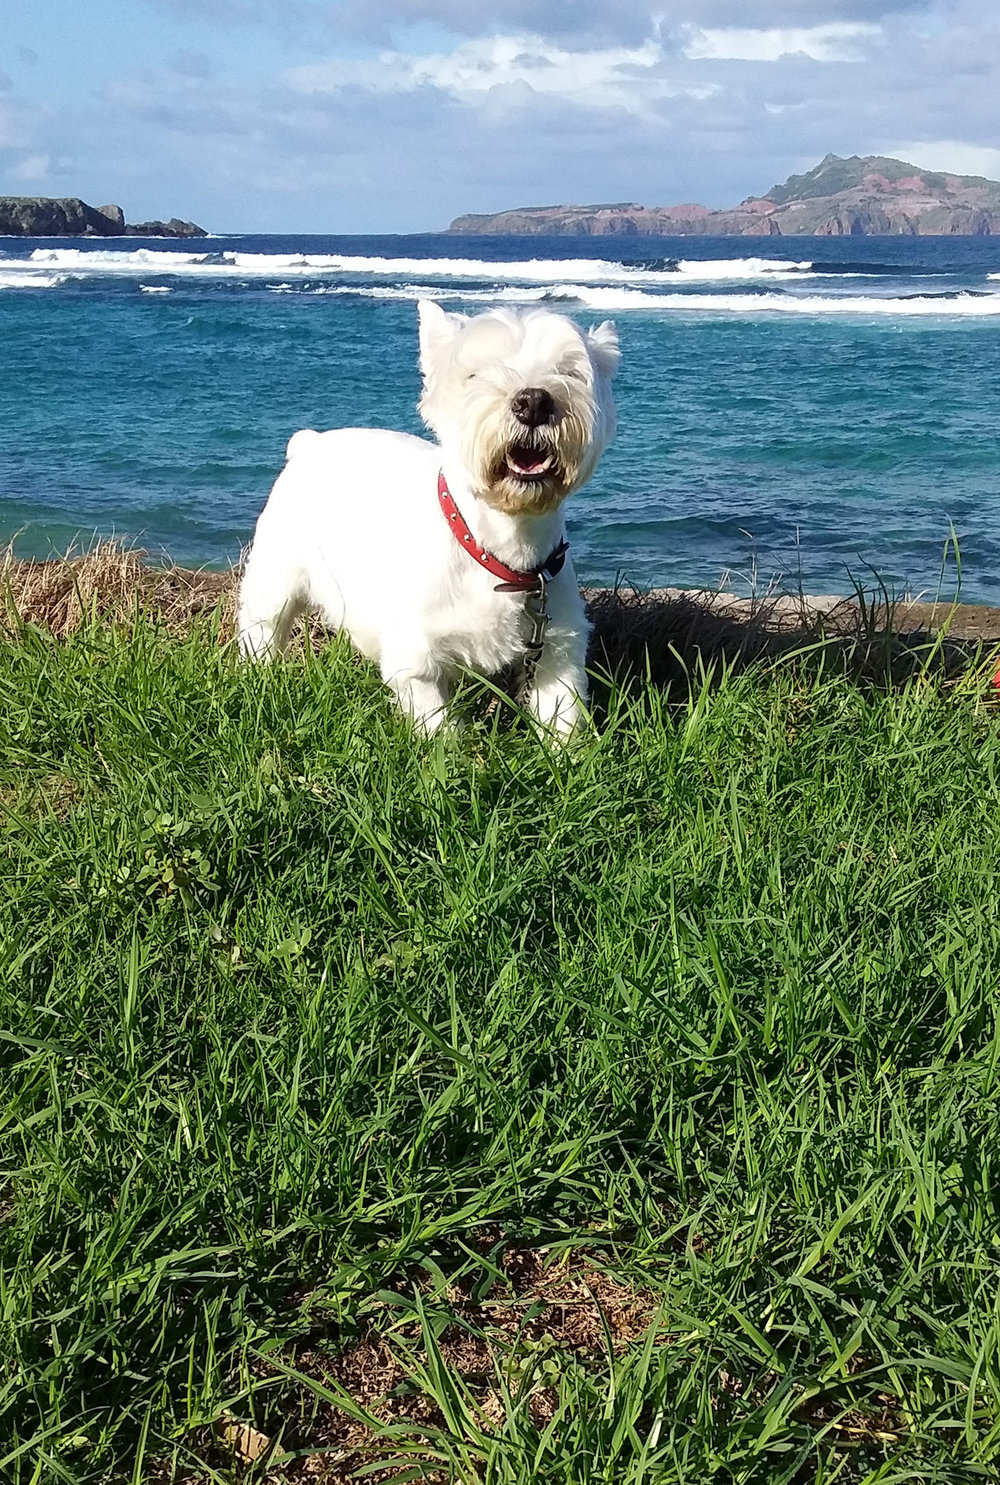 Old Monty enjoying mornings by the sea, Kingston, Norfolk Island